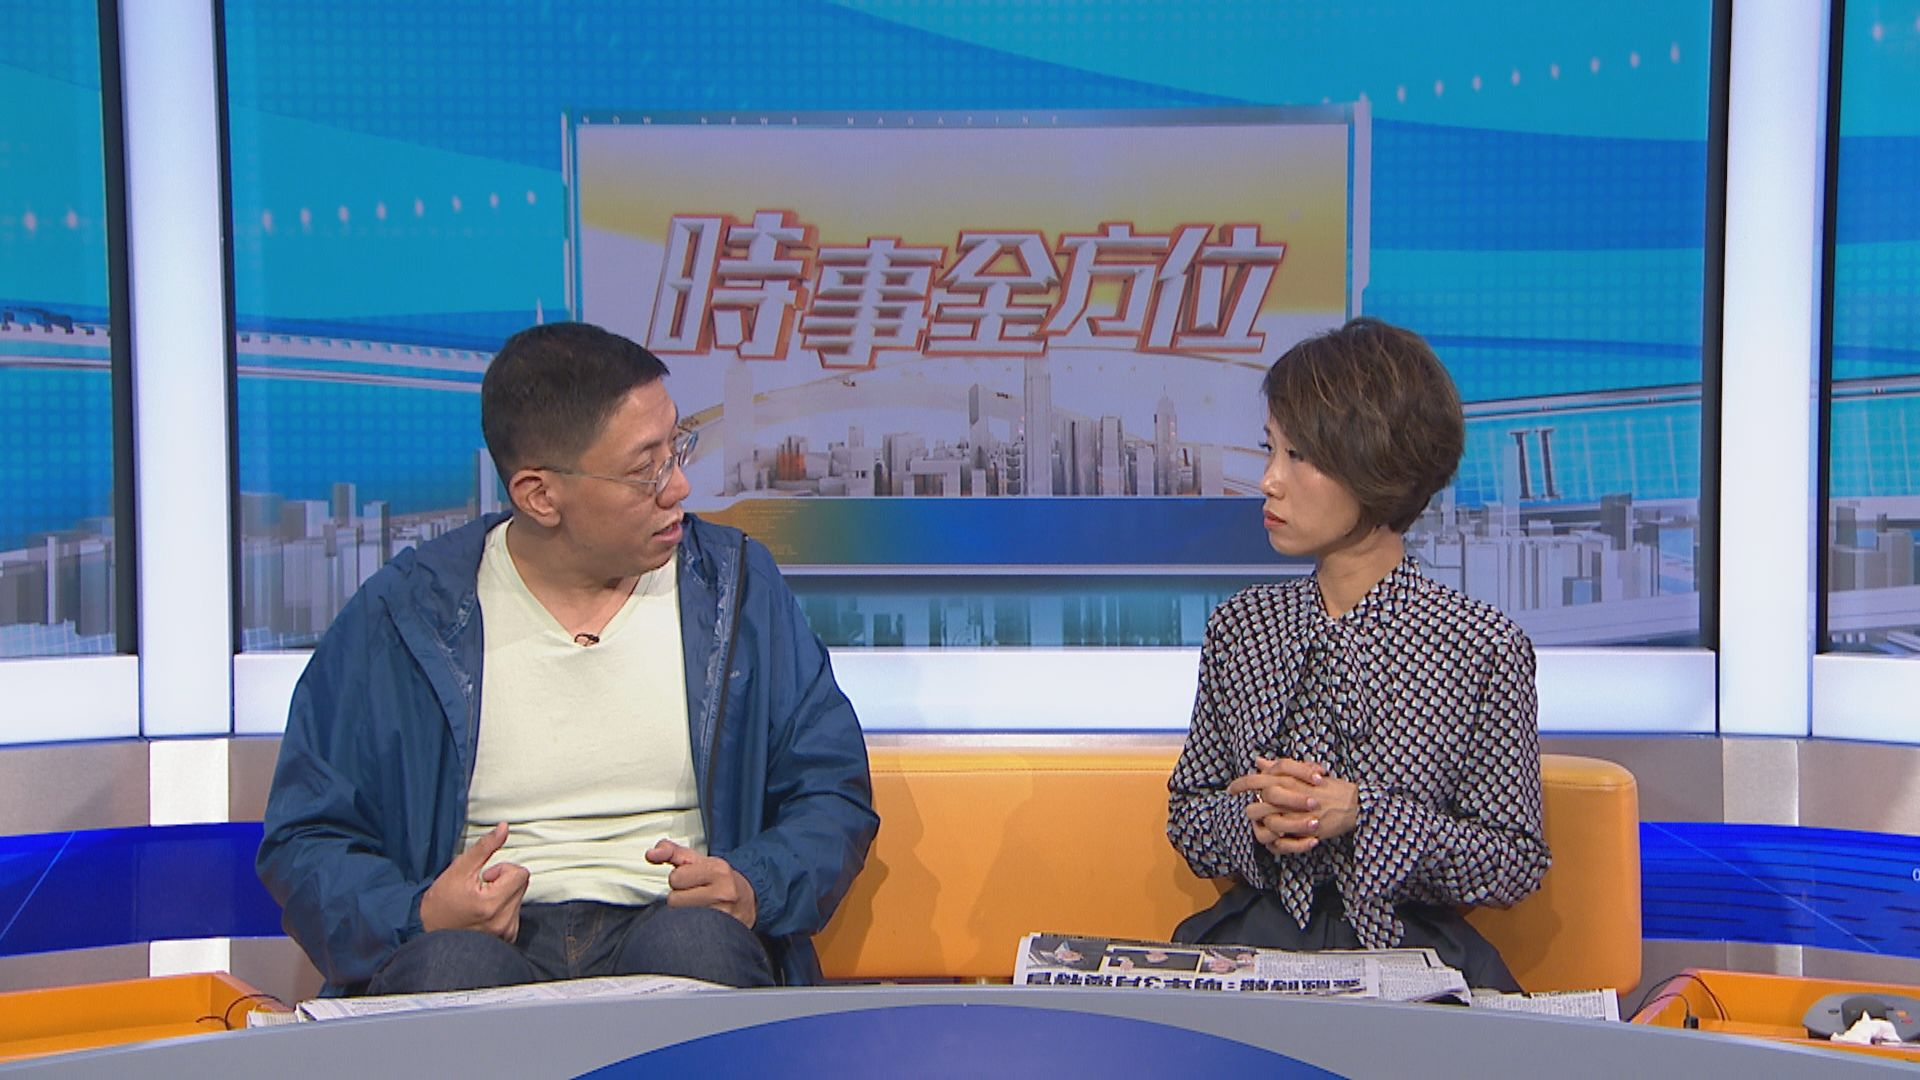 【MAX觀點】傳北京擬換特首 首要要求勿成中美貿談絆腳石?